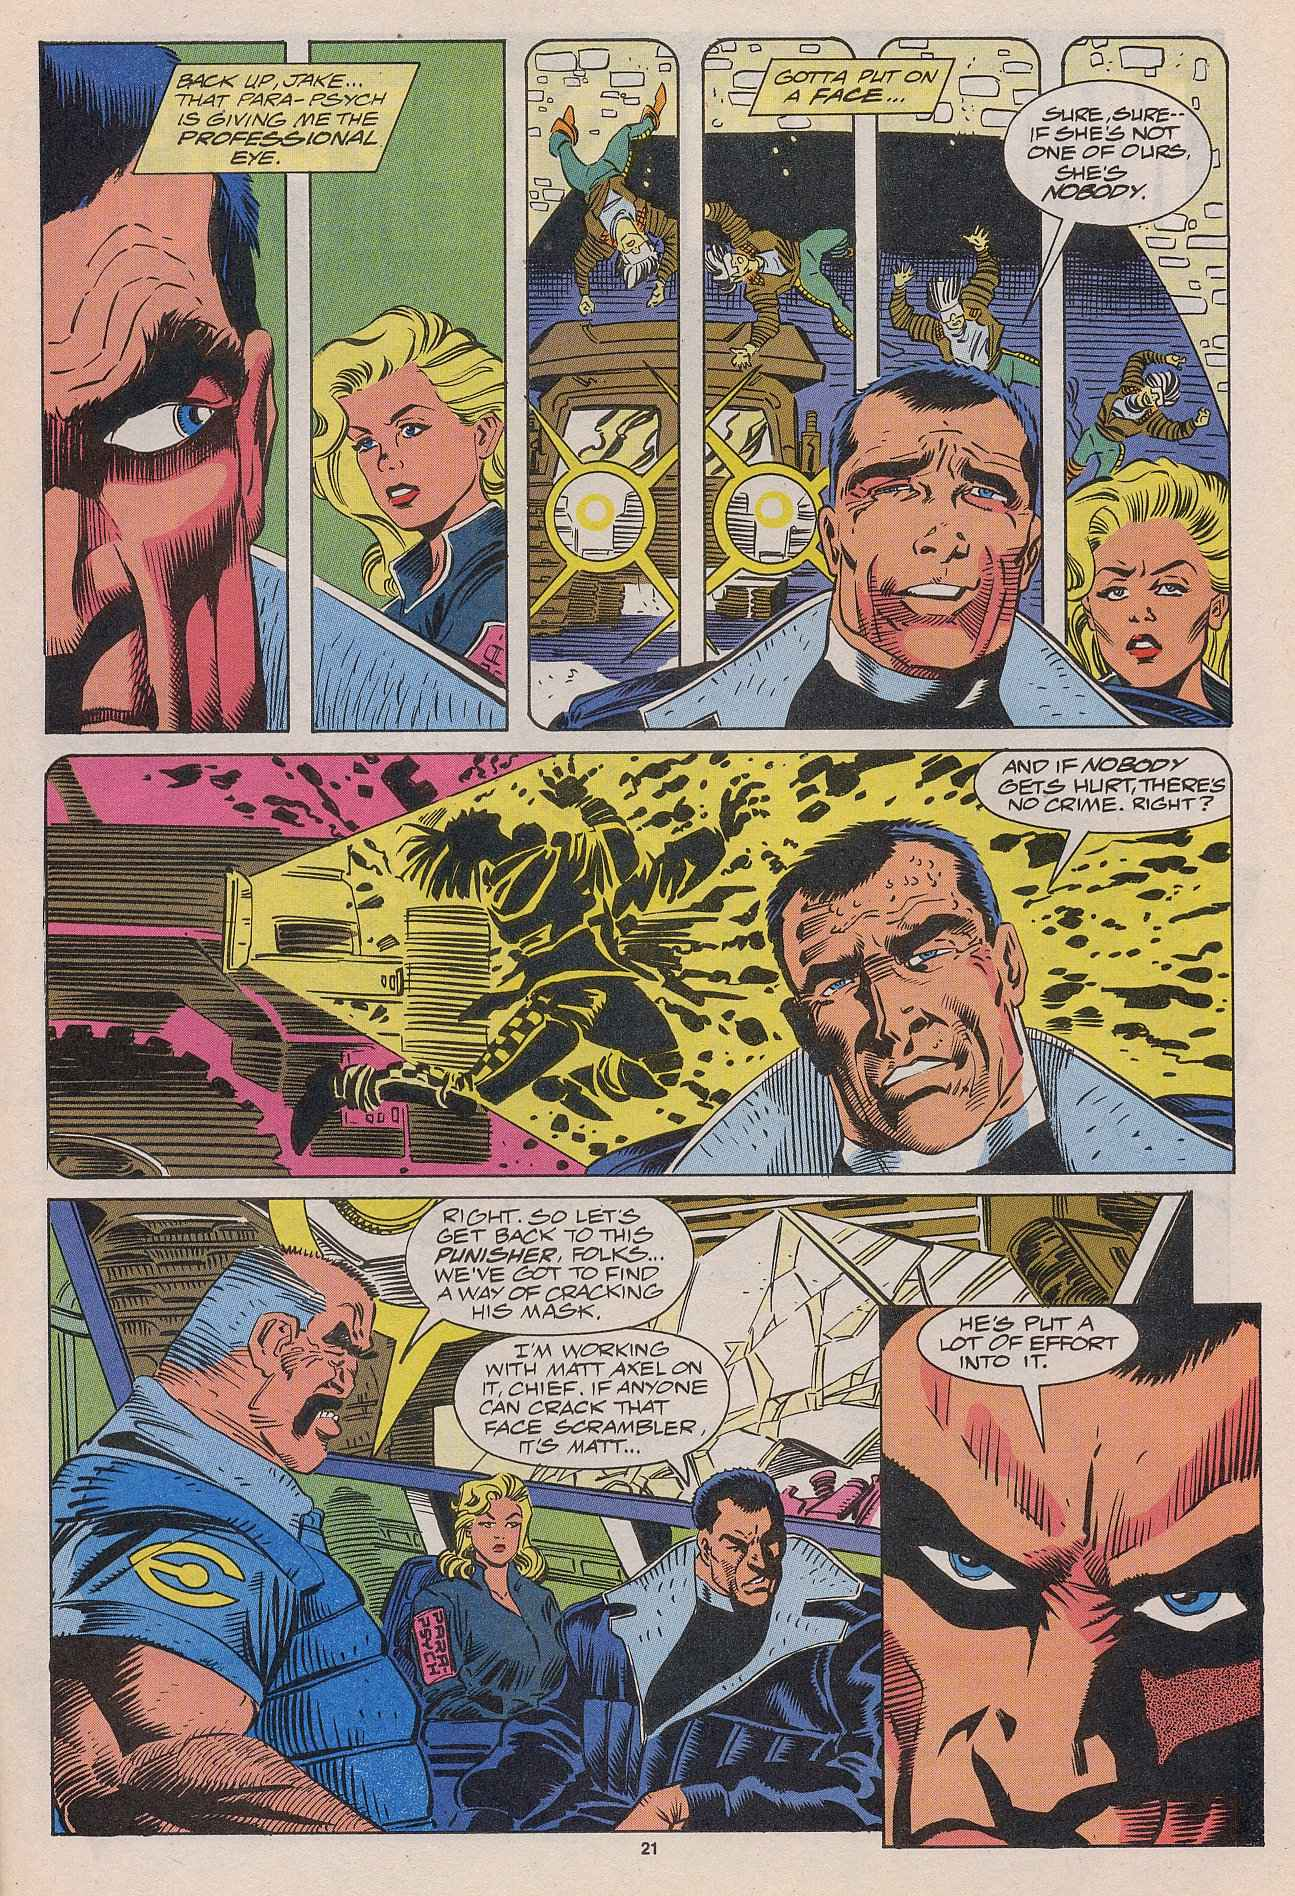 The Punisher 2099 #003 - 17.jpg